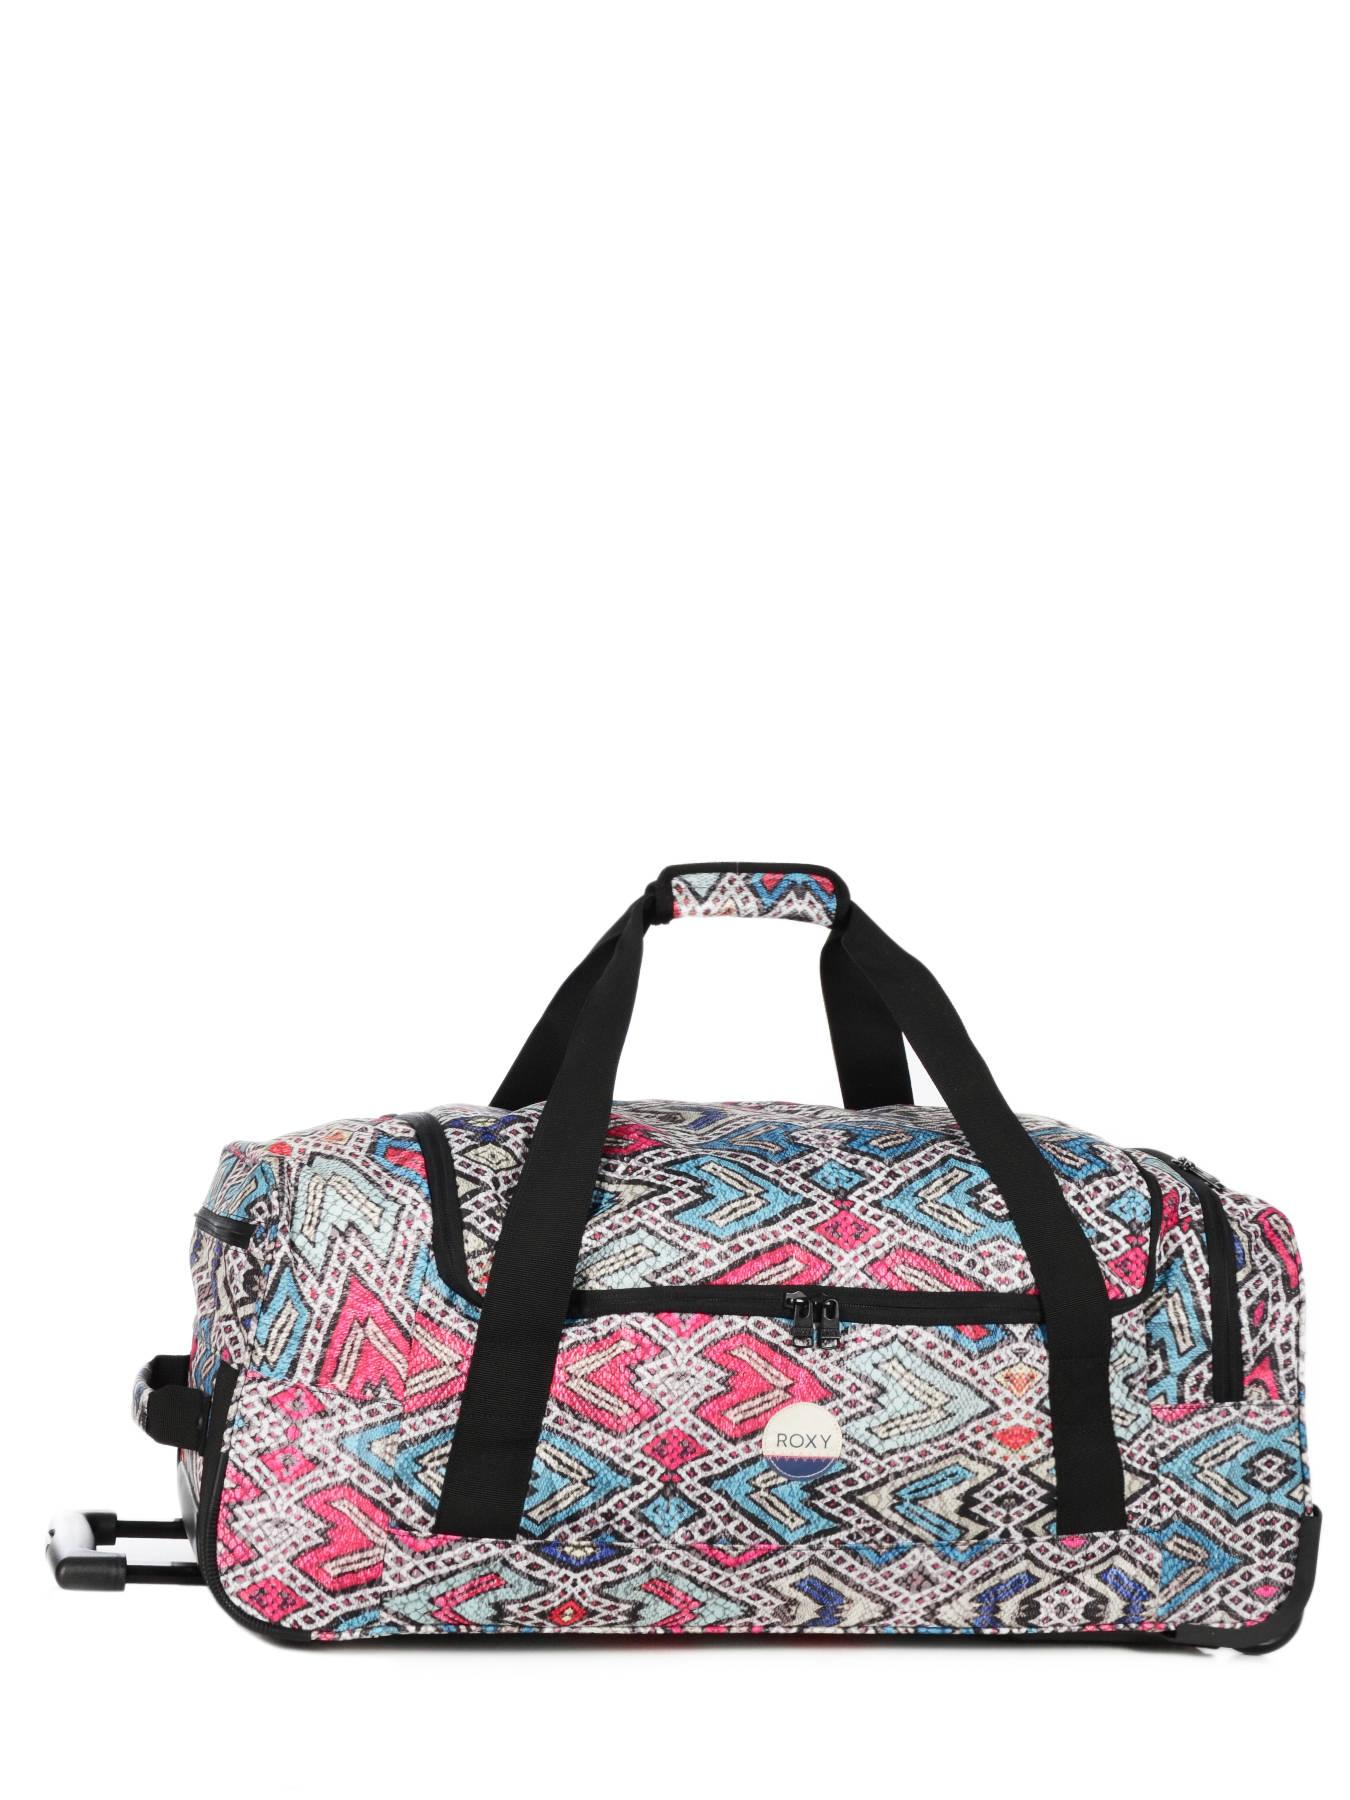 sac de voyage roxy luggage regata soaring en vente au meilleur prix. Black Bedroom Furniture Sets. Home Design Ideas